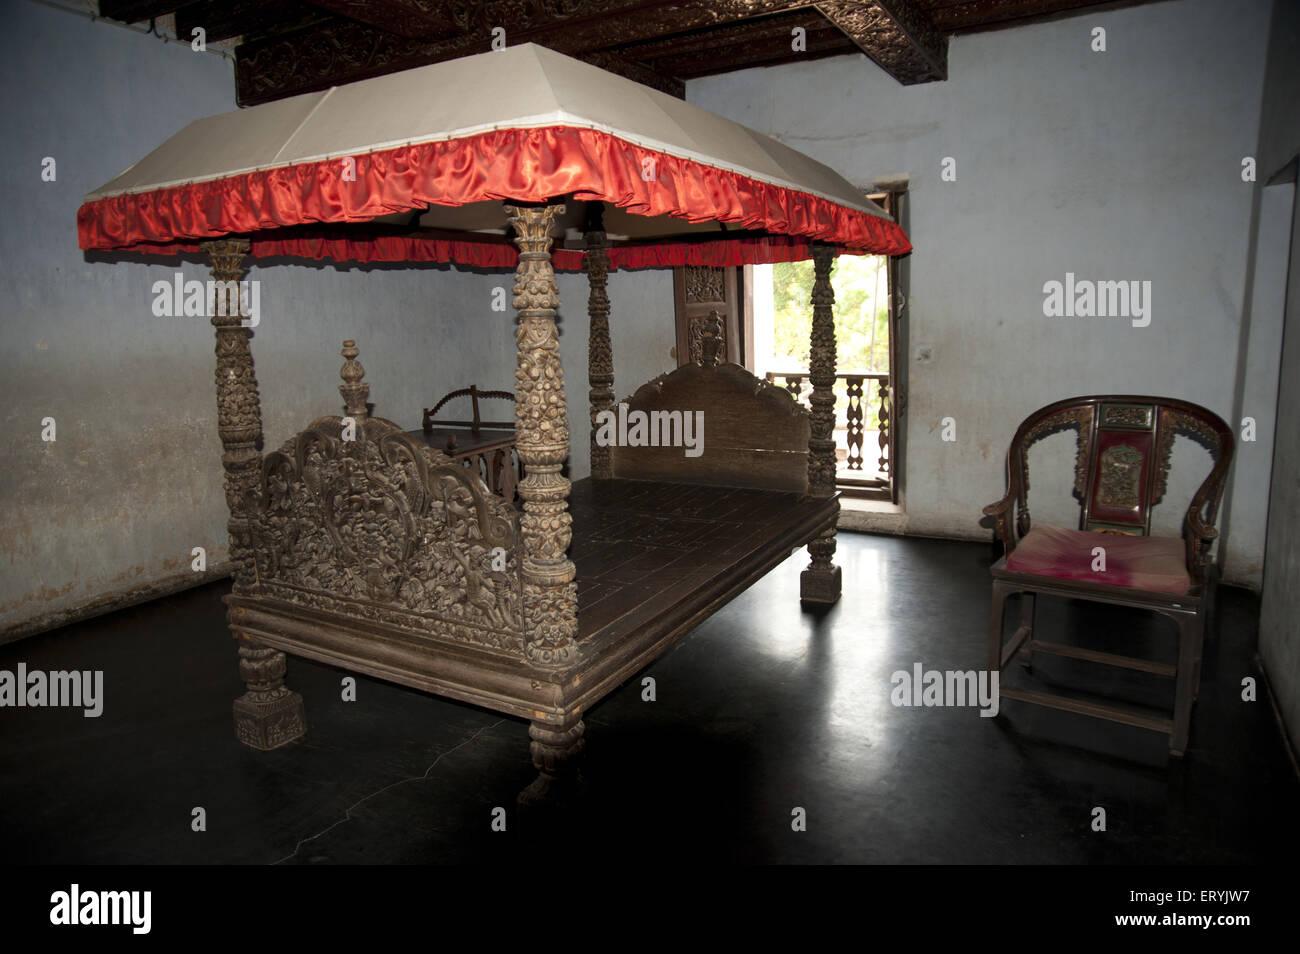 King Cot in Padmanabhapuram Palace at kerala India - Stock Image